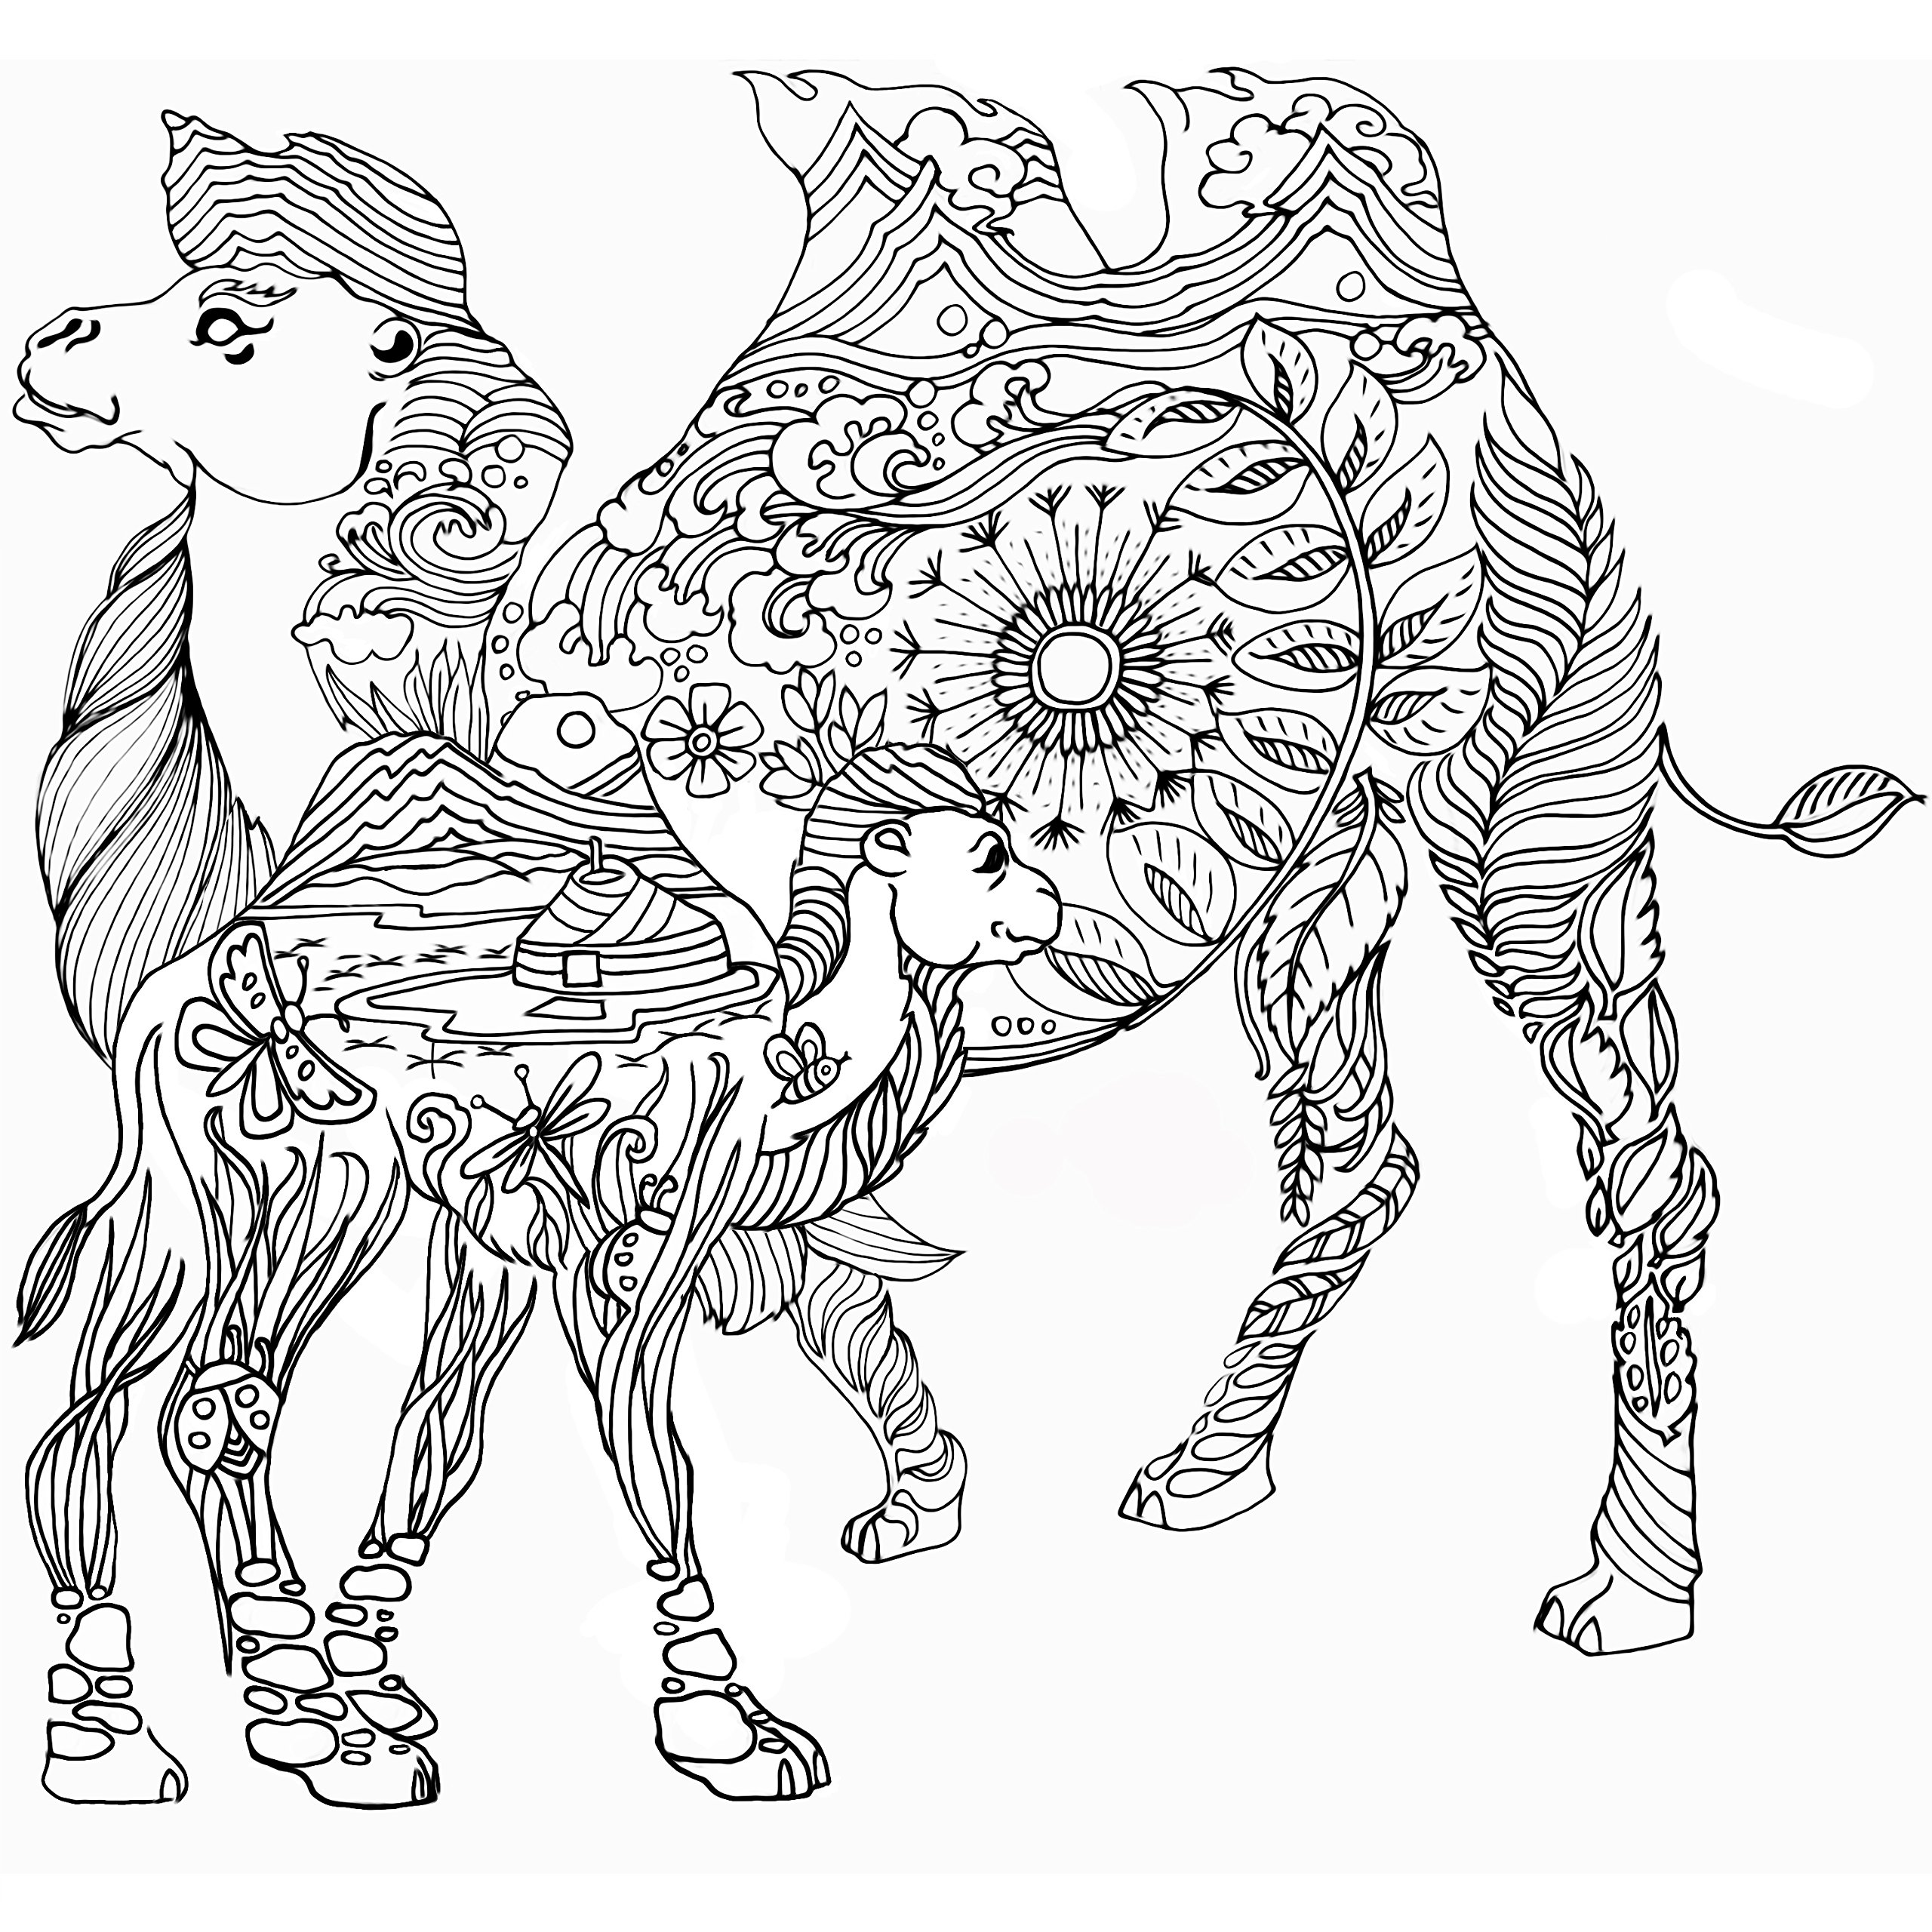 magnificent mongolia urambileg boldgarav zolboo ganbold itgel Mongolia Winter magnificent mongolia urambileg boldgarav zolboo ganbold itgel chuluunbaatar sugarjav altan ochir 9789997335562 amazon books